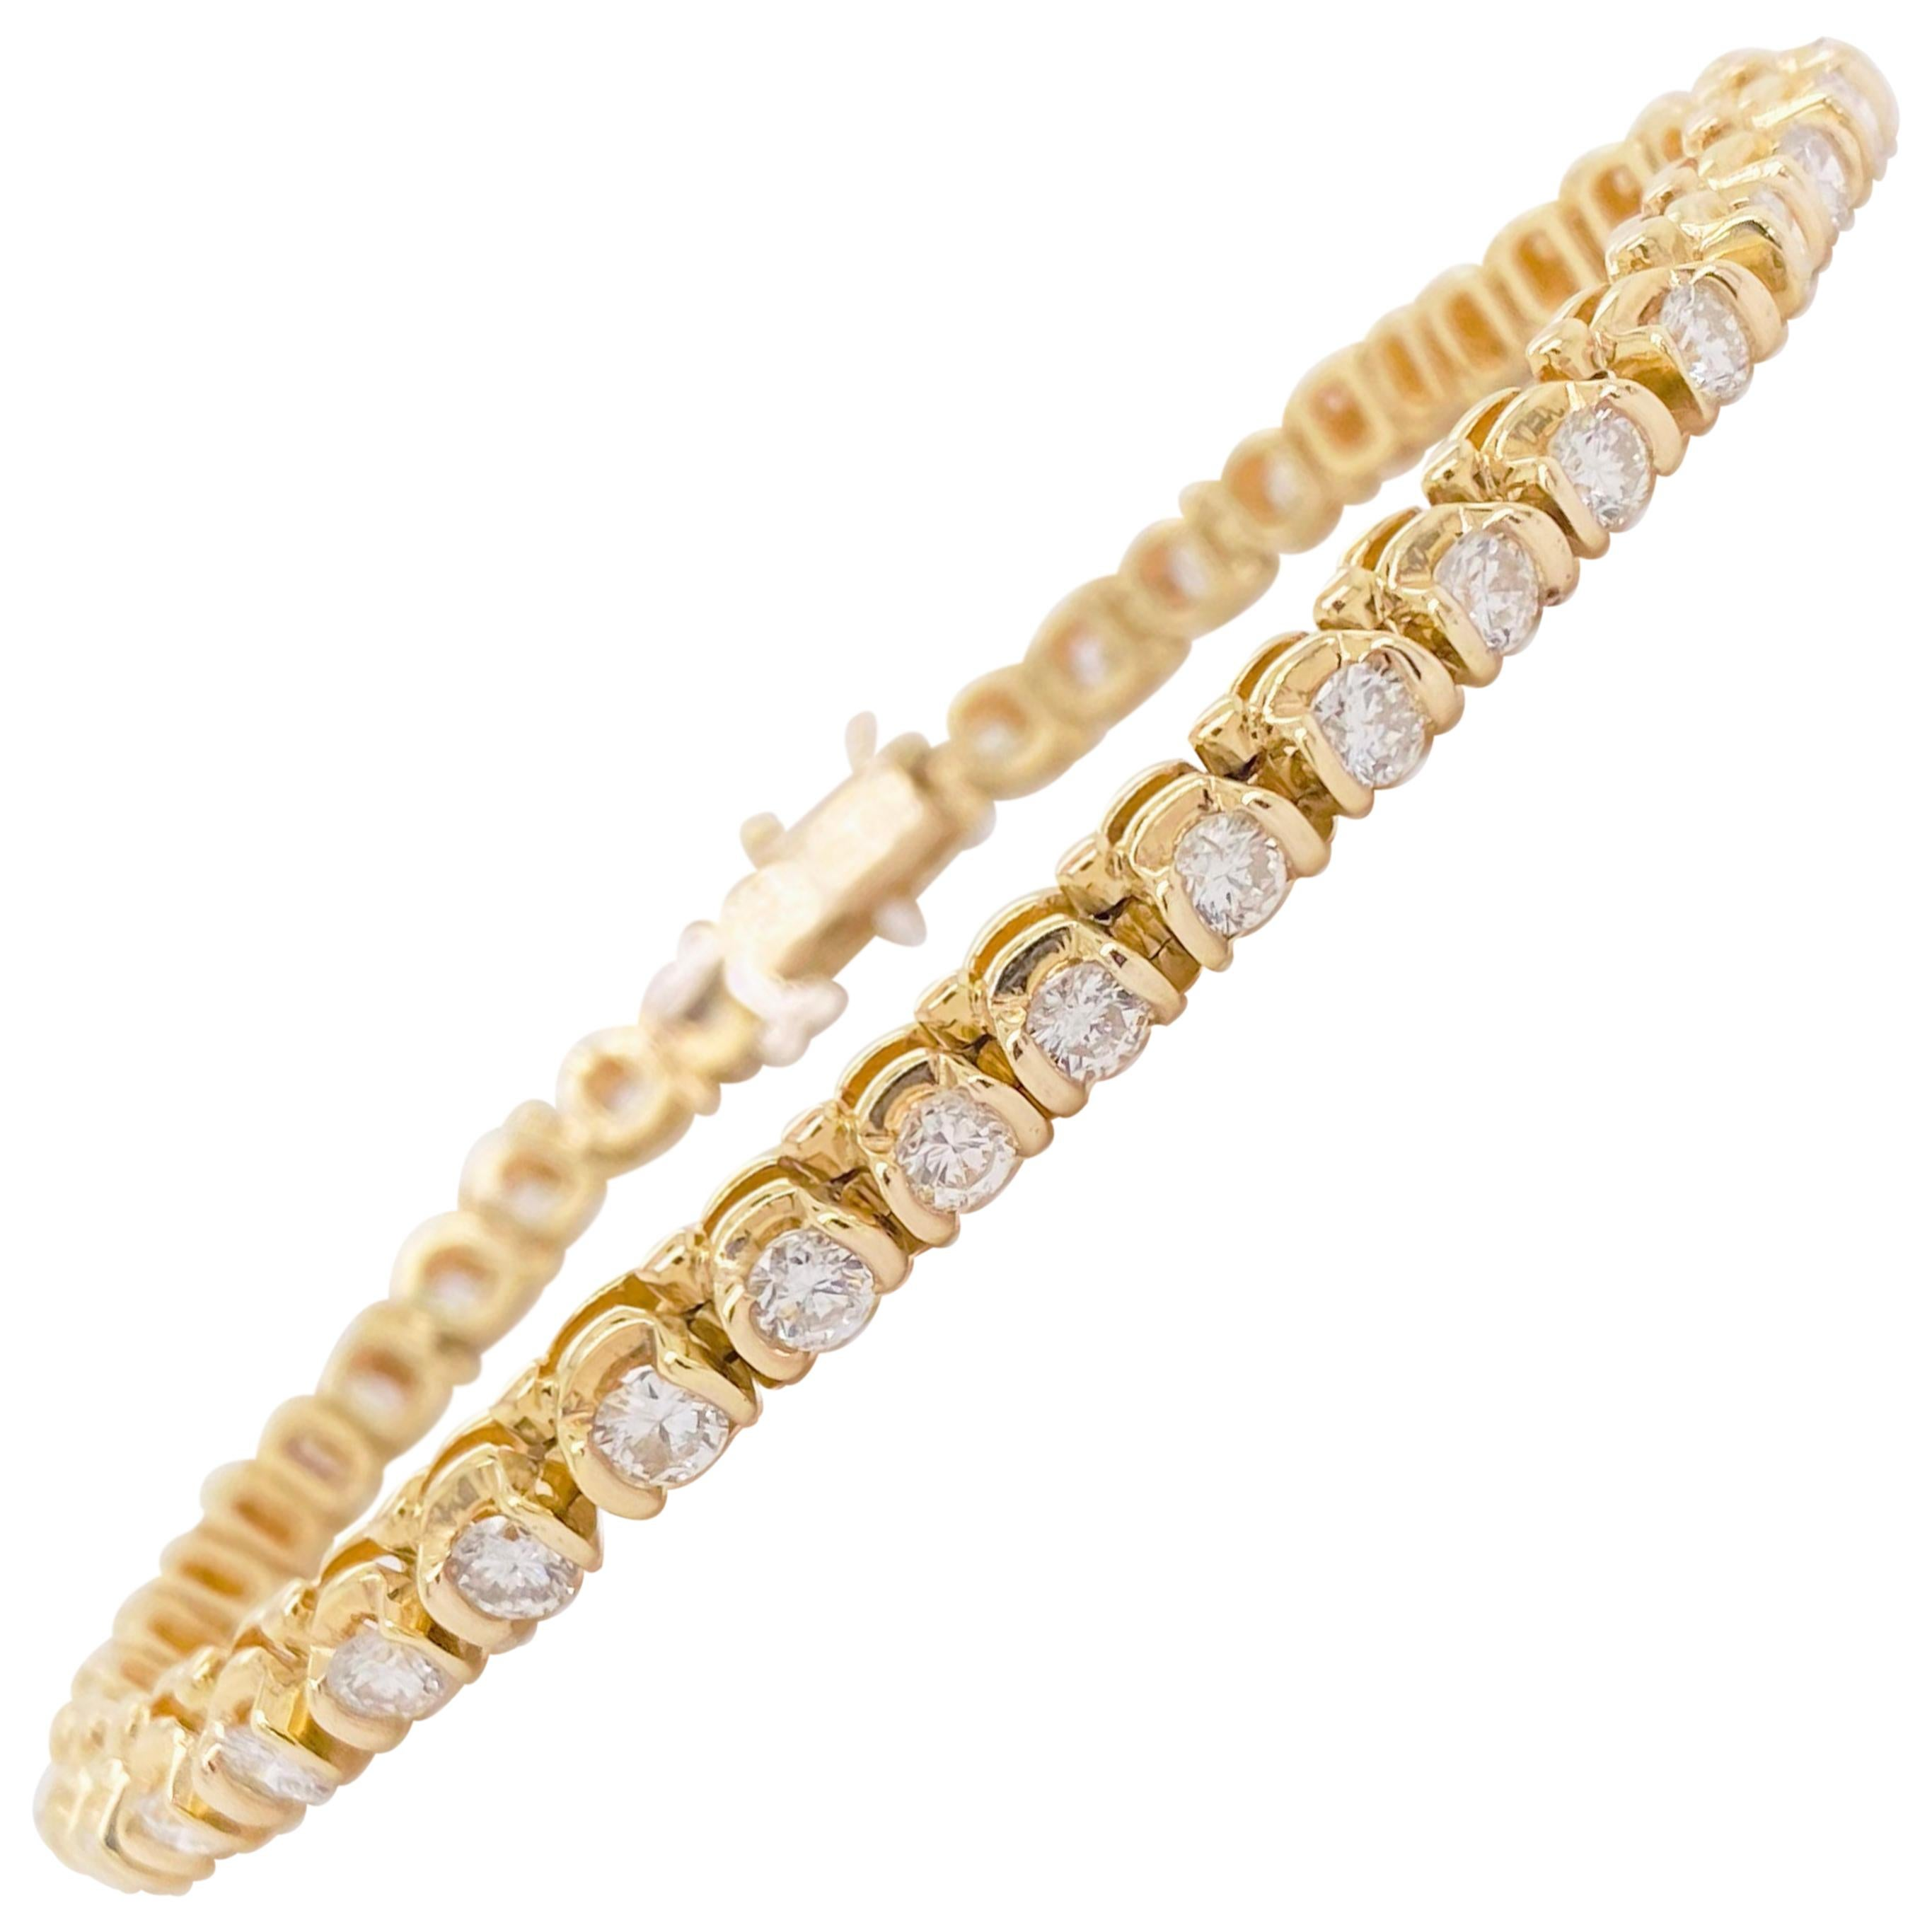 Diamond Tennis Bracelet, 5 Carat Diamond Bracelet, Yellow Gold, Gift